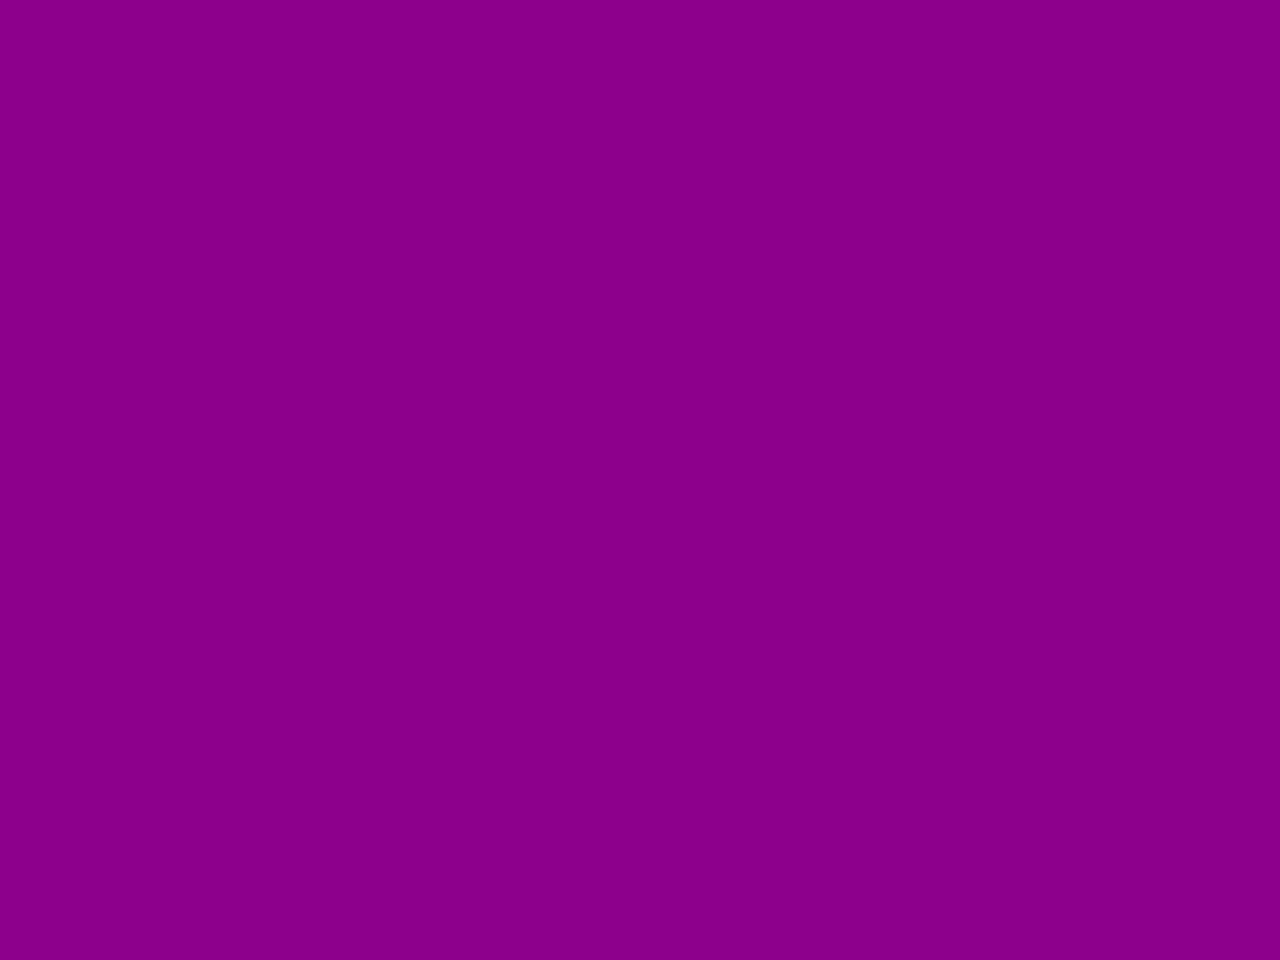 1280x960 dark magenta solid color background - Dark magenta wallpaper ...